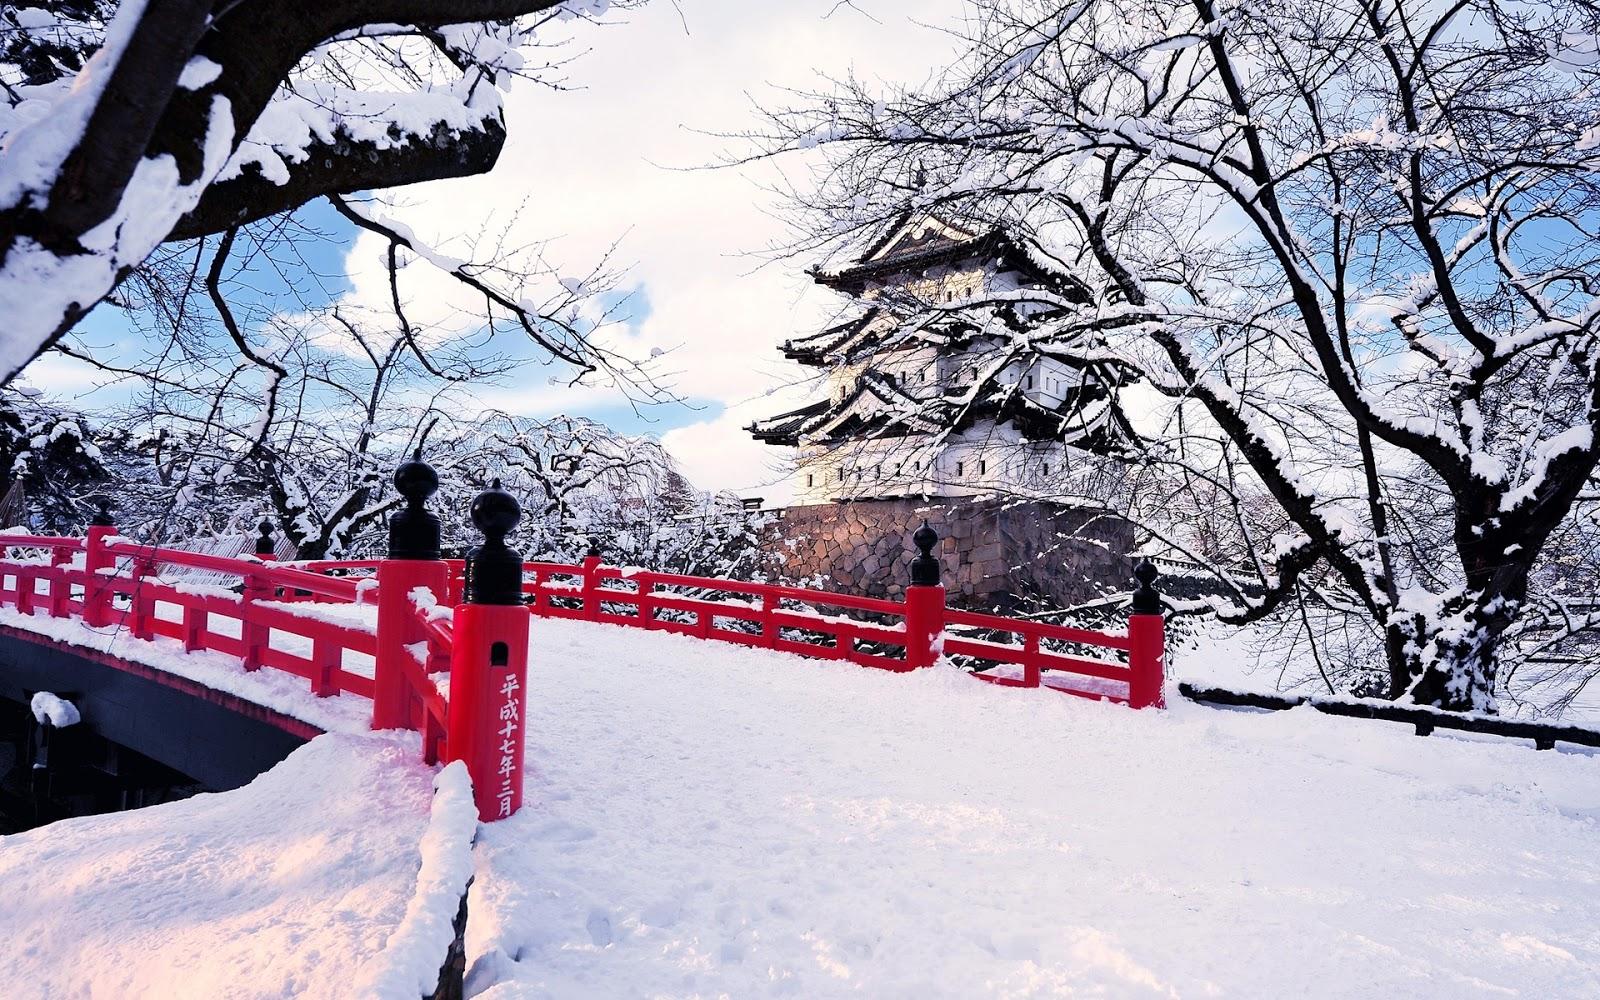 http://3.bp.blogspot.com/-vIWXAM4uXfA/VPKxoXYEygI/AAAAAAAACOs/PpXN7GNg2Eo/s1600/Japan-Aomori-Prefecture-Hirosaki-winter-snow-bridge-castel-ice-trees_1920x1200.jpg